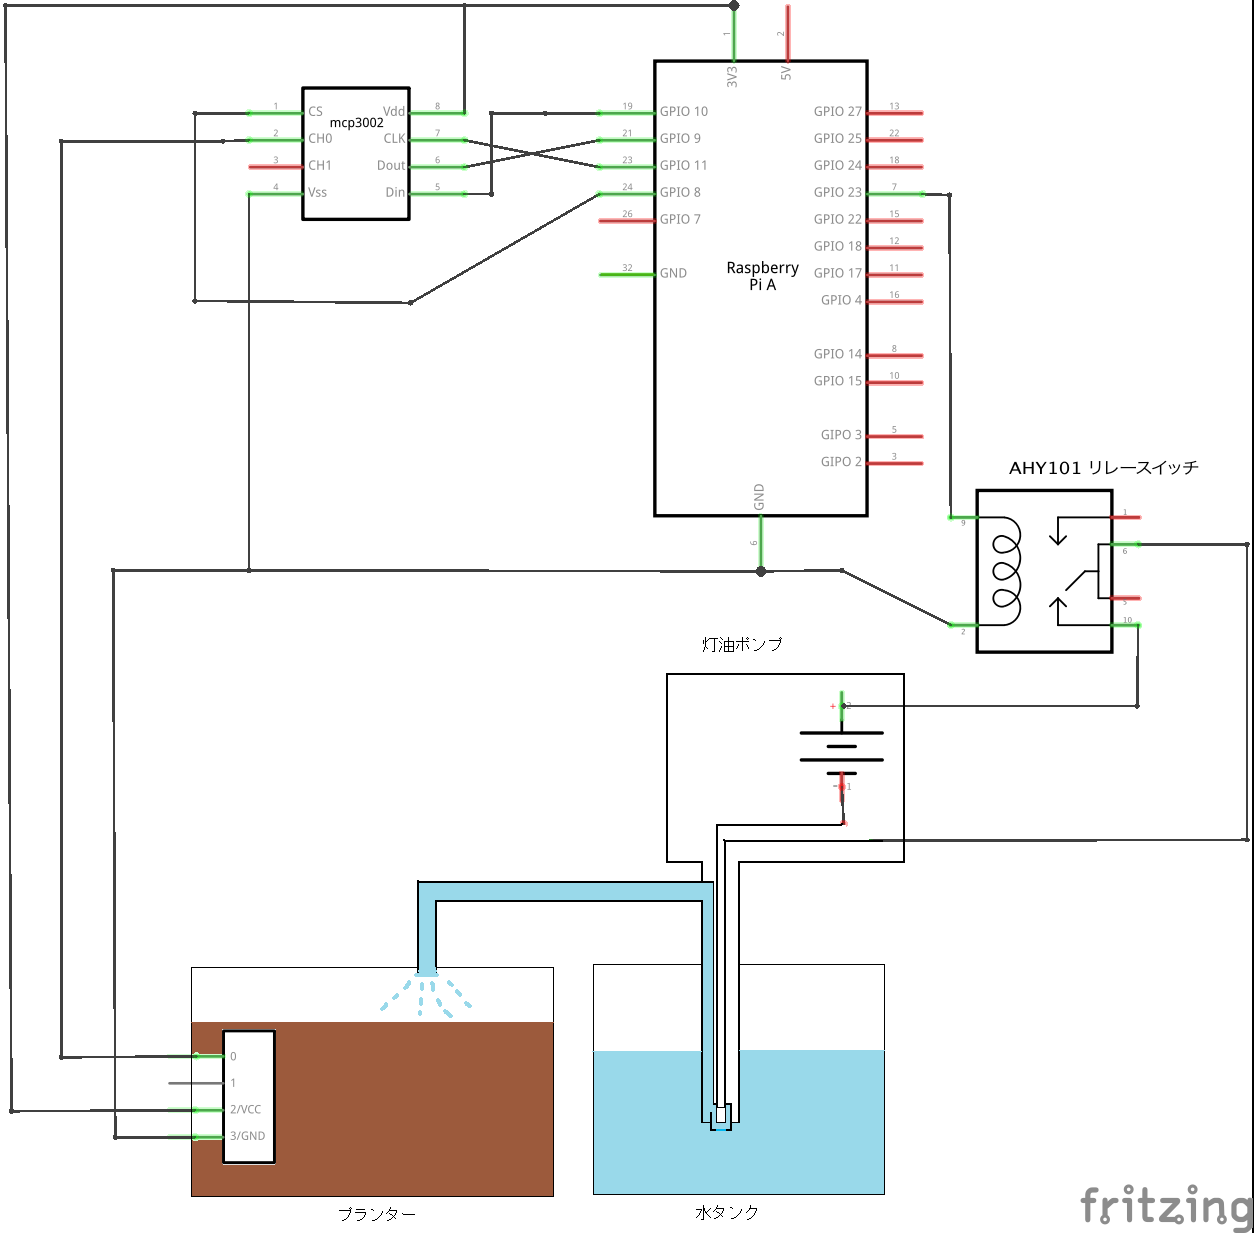 water_system_回路図.png